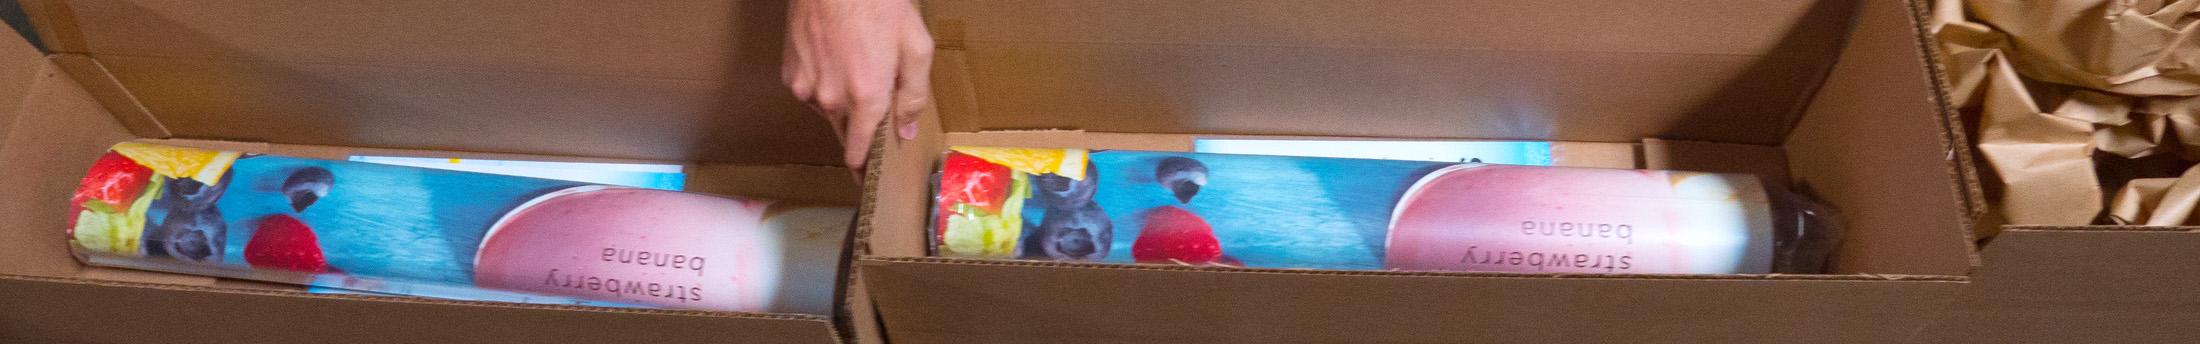 fulfillment boxes